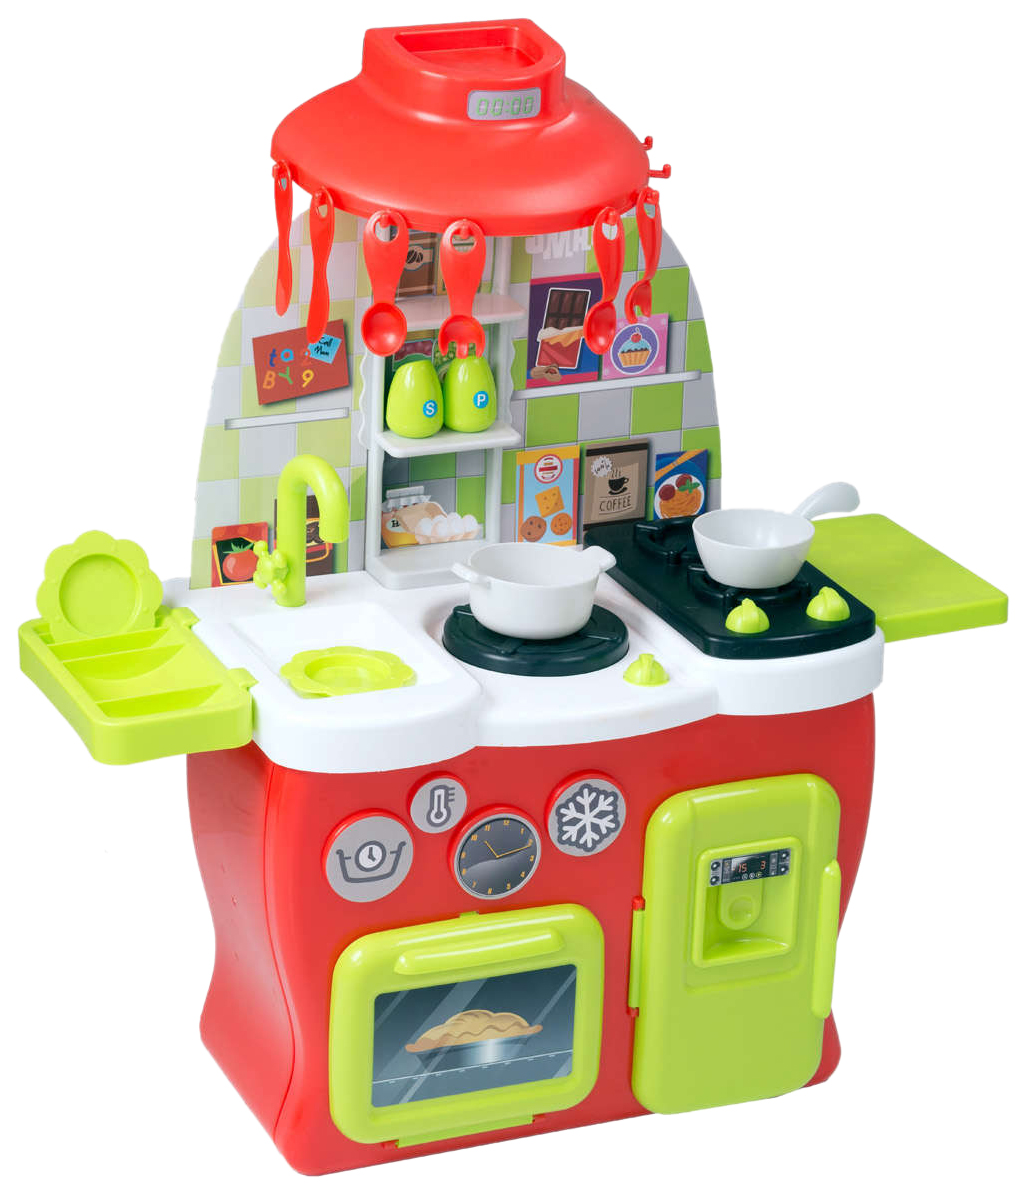 Детская кухня HTI Smart Моя первая электронная кухня